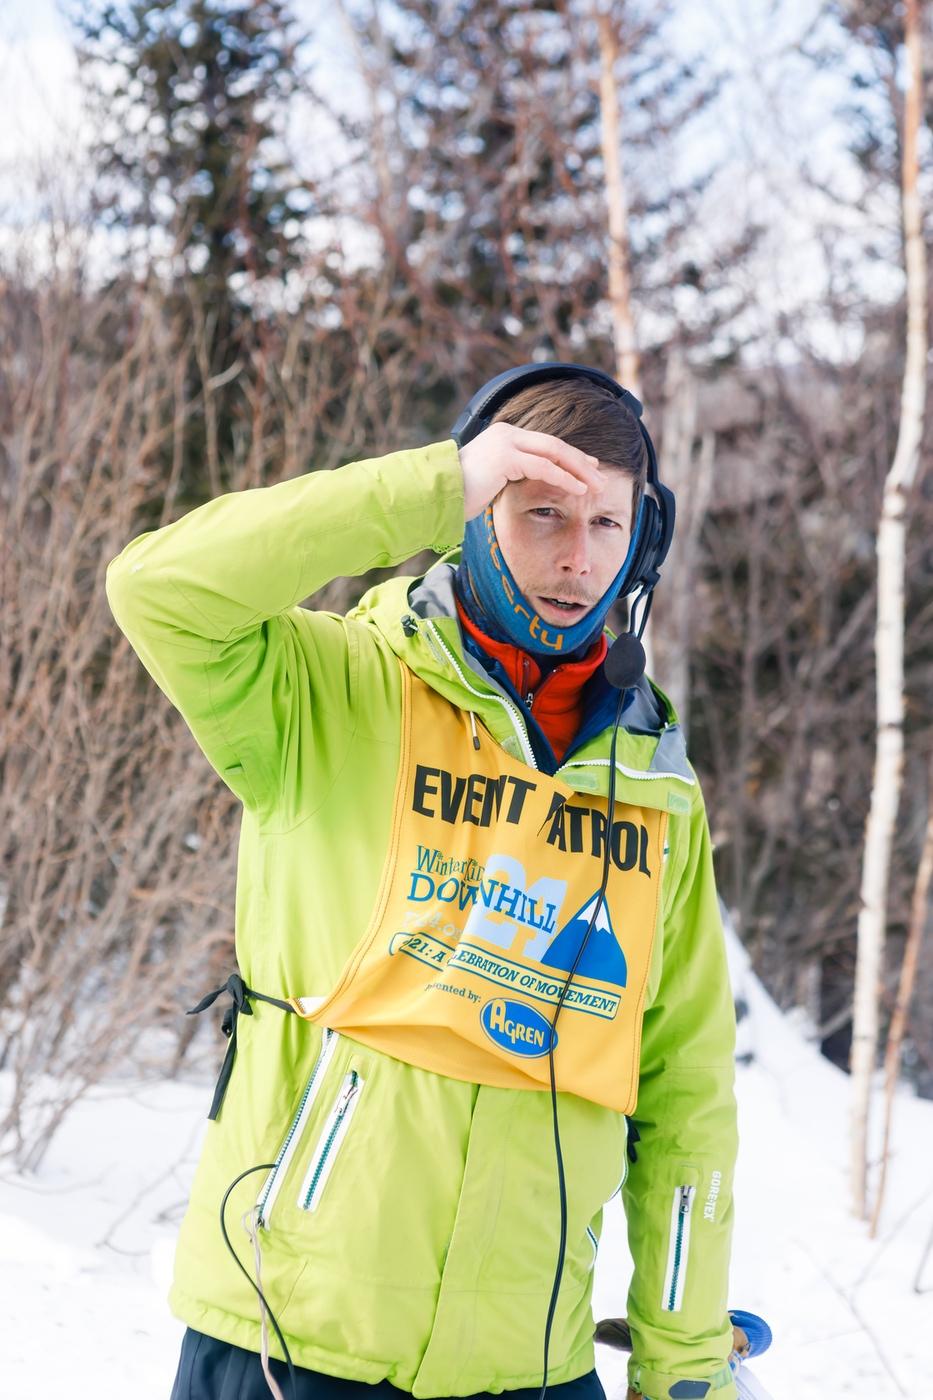 WinterKids Downhill 24 2021 SDP 3324